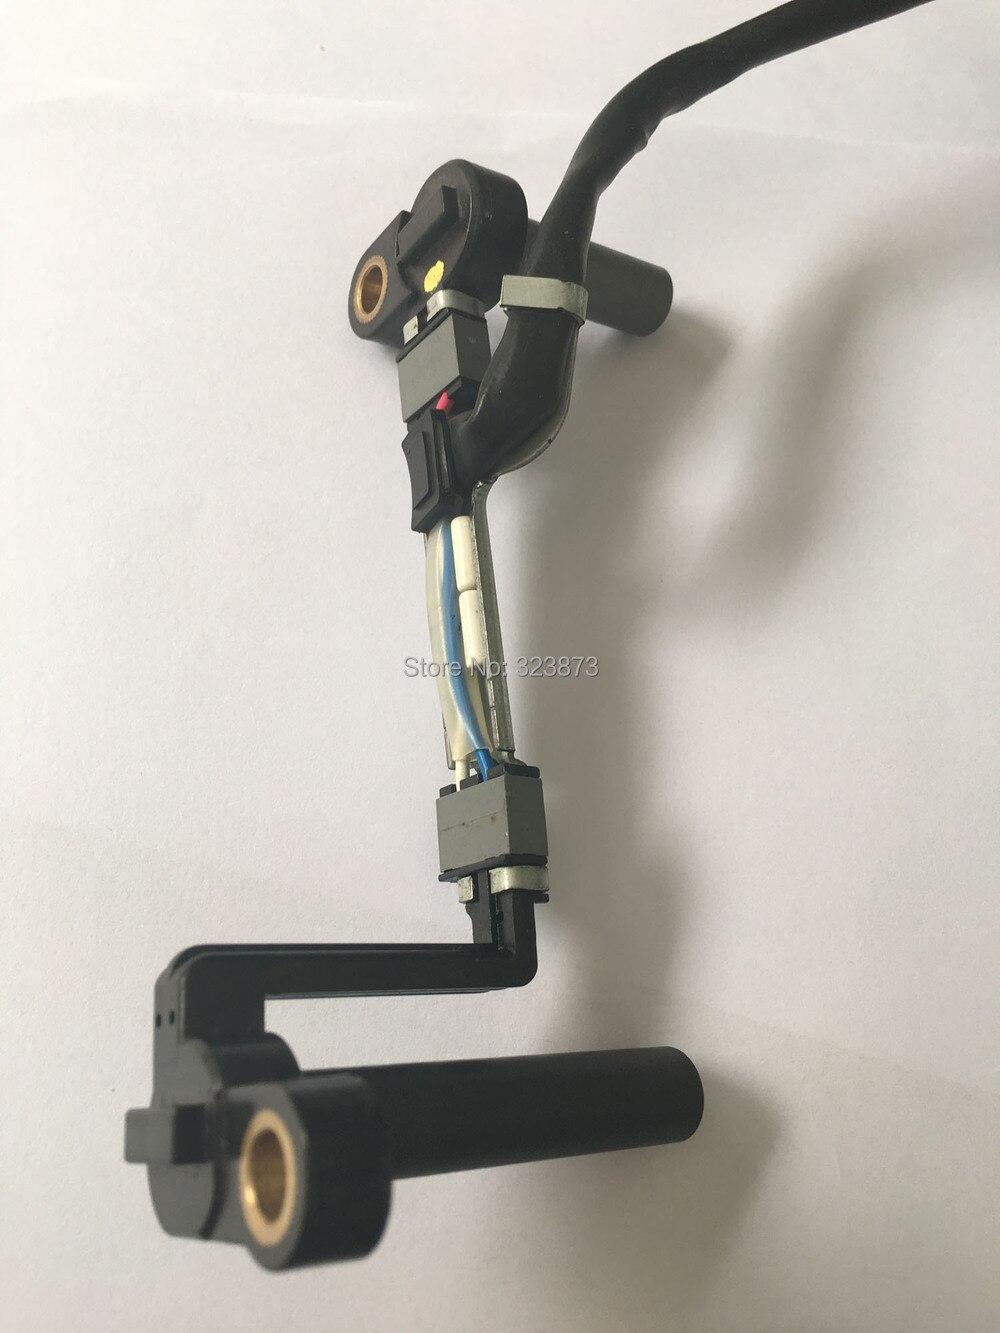 Camshaft Cam Position Sensor 11 14 for KIA SONATA AZERA SANTA FE AUTO TRANS INPUT SPEED SENSOR 42620-3B100 K-M